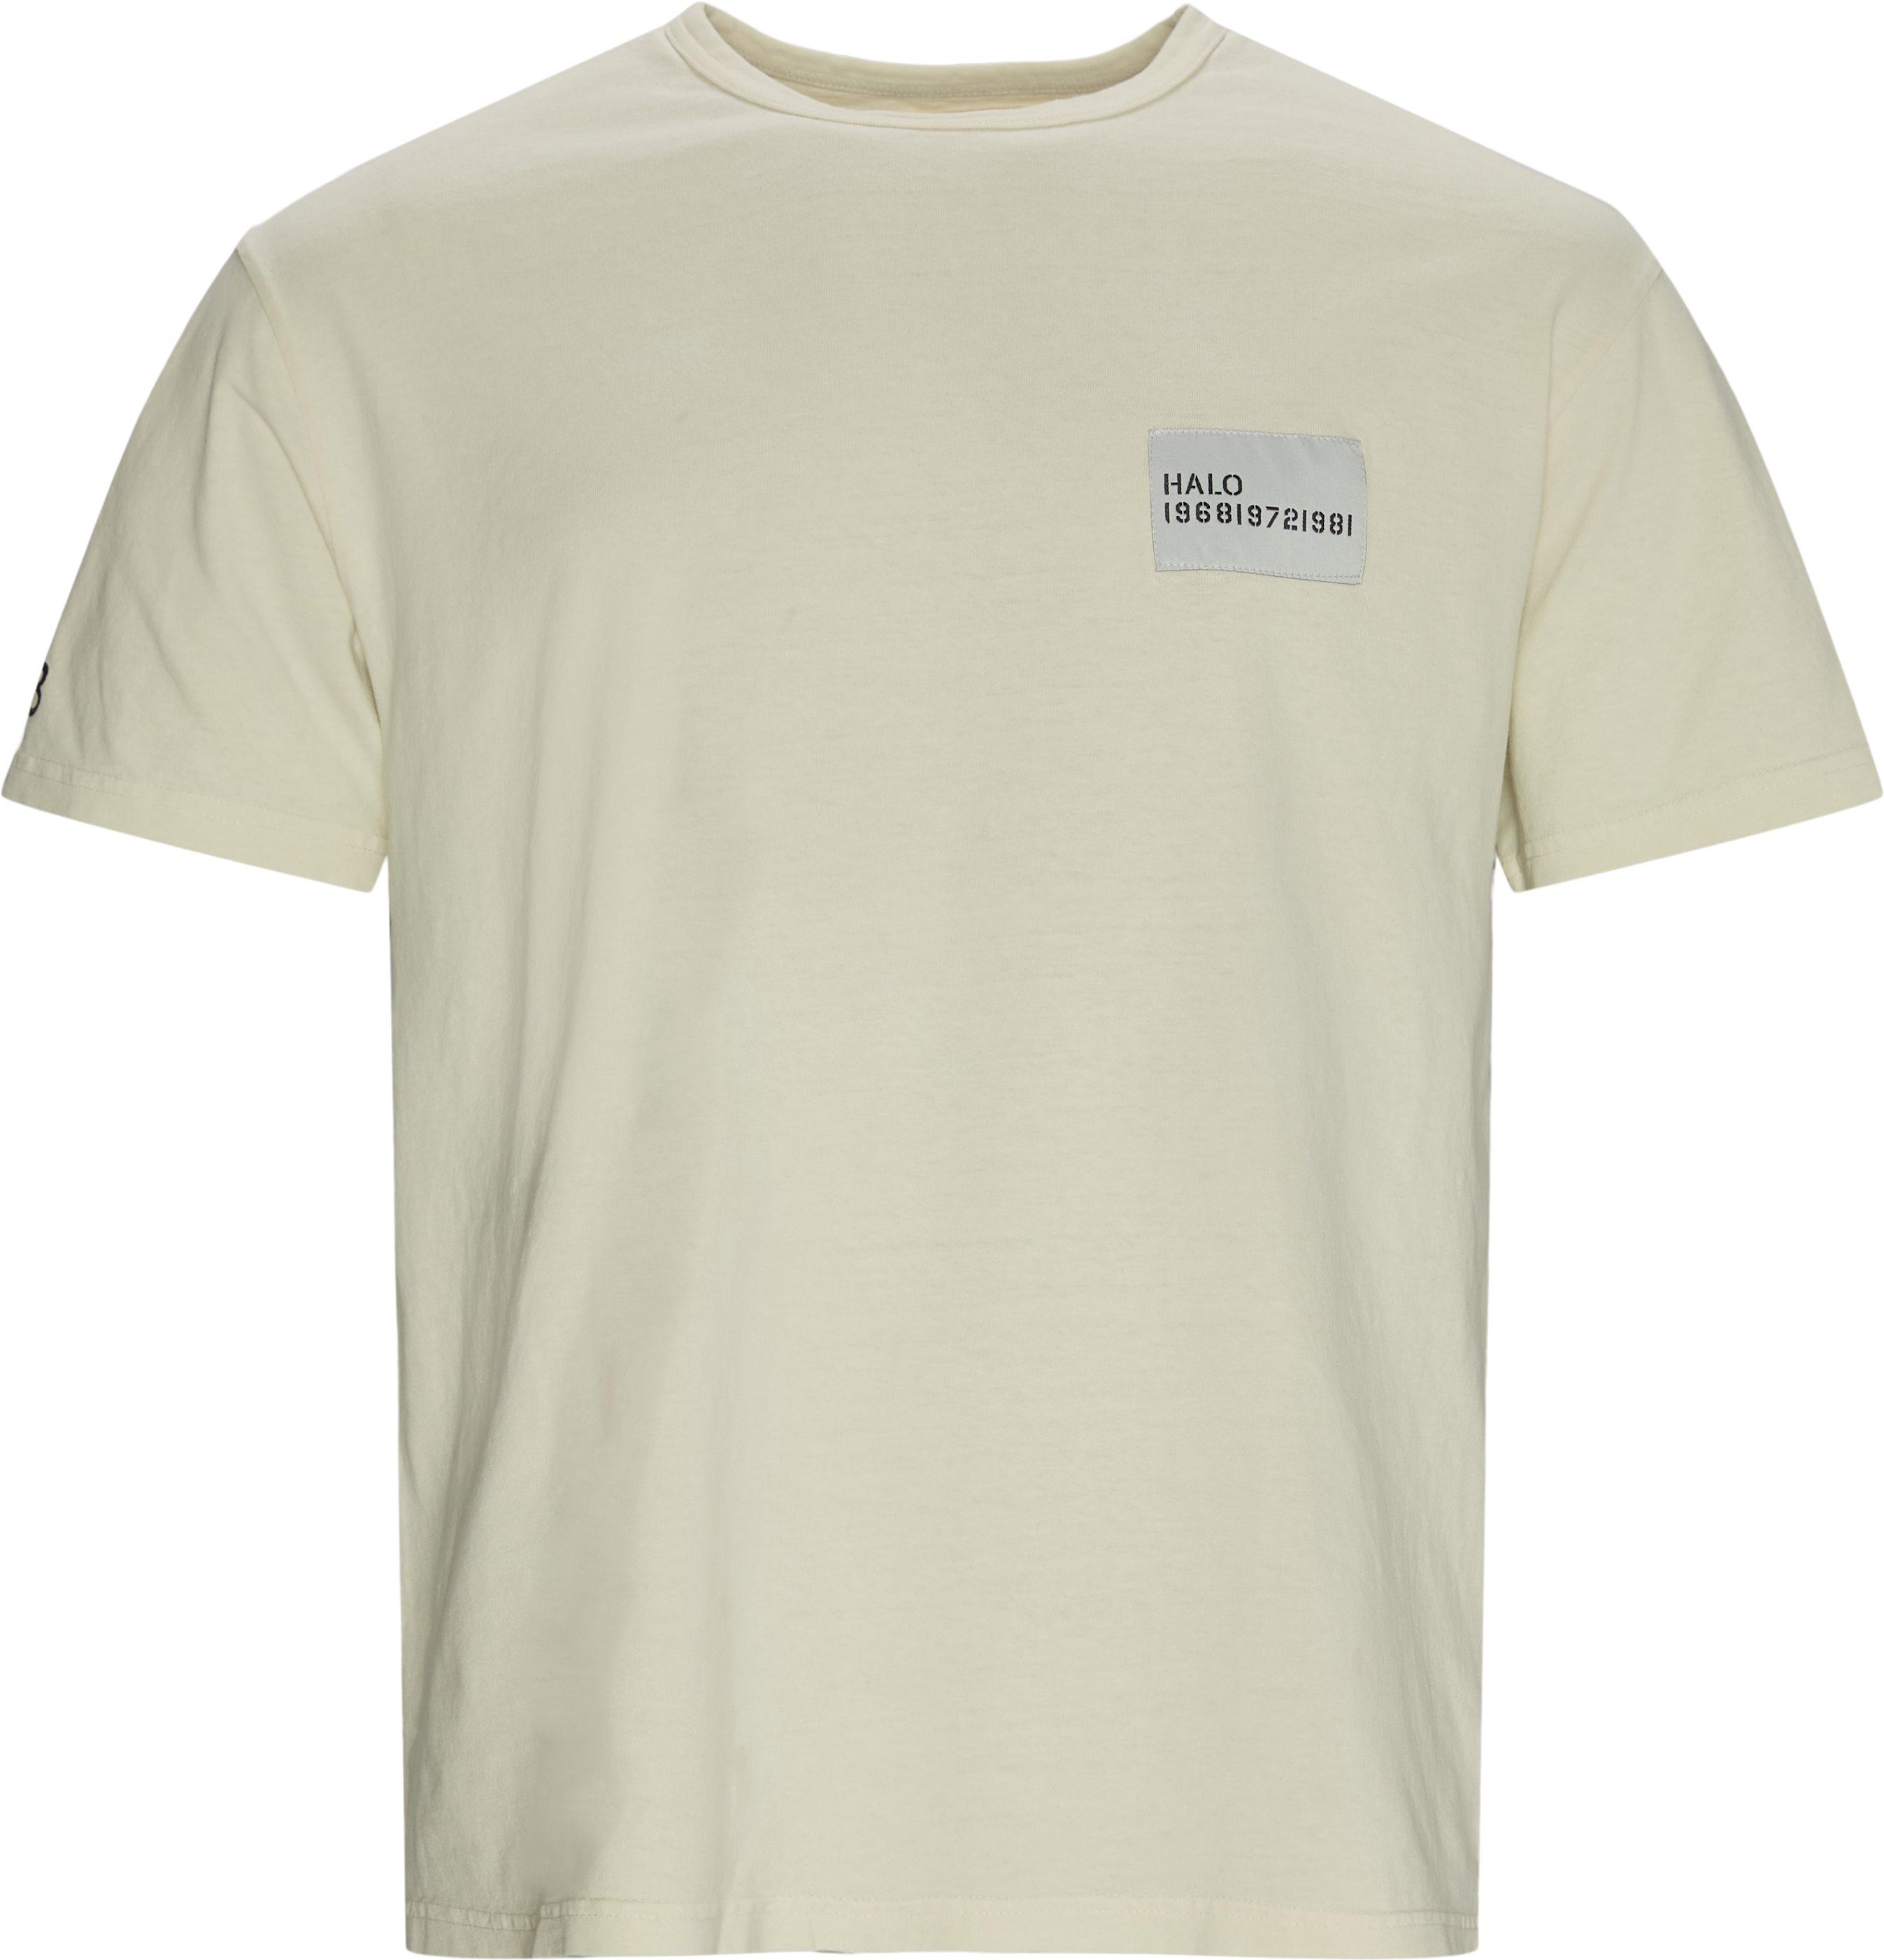 Heavy Cotton Tee - T-shirts - Regular fit - Vit